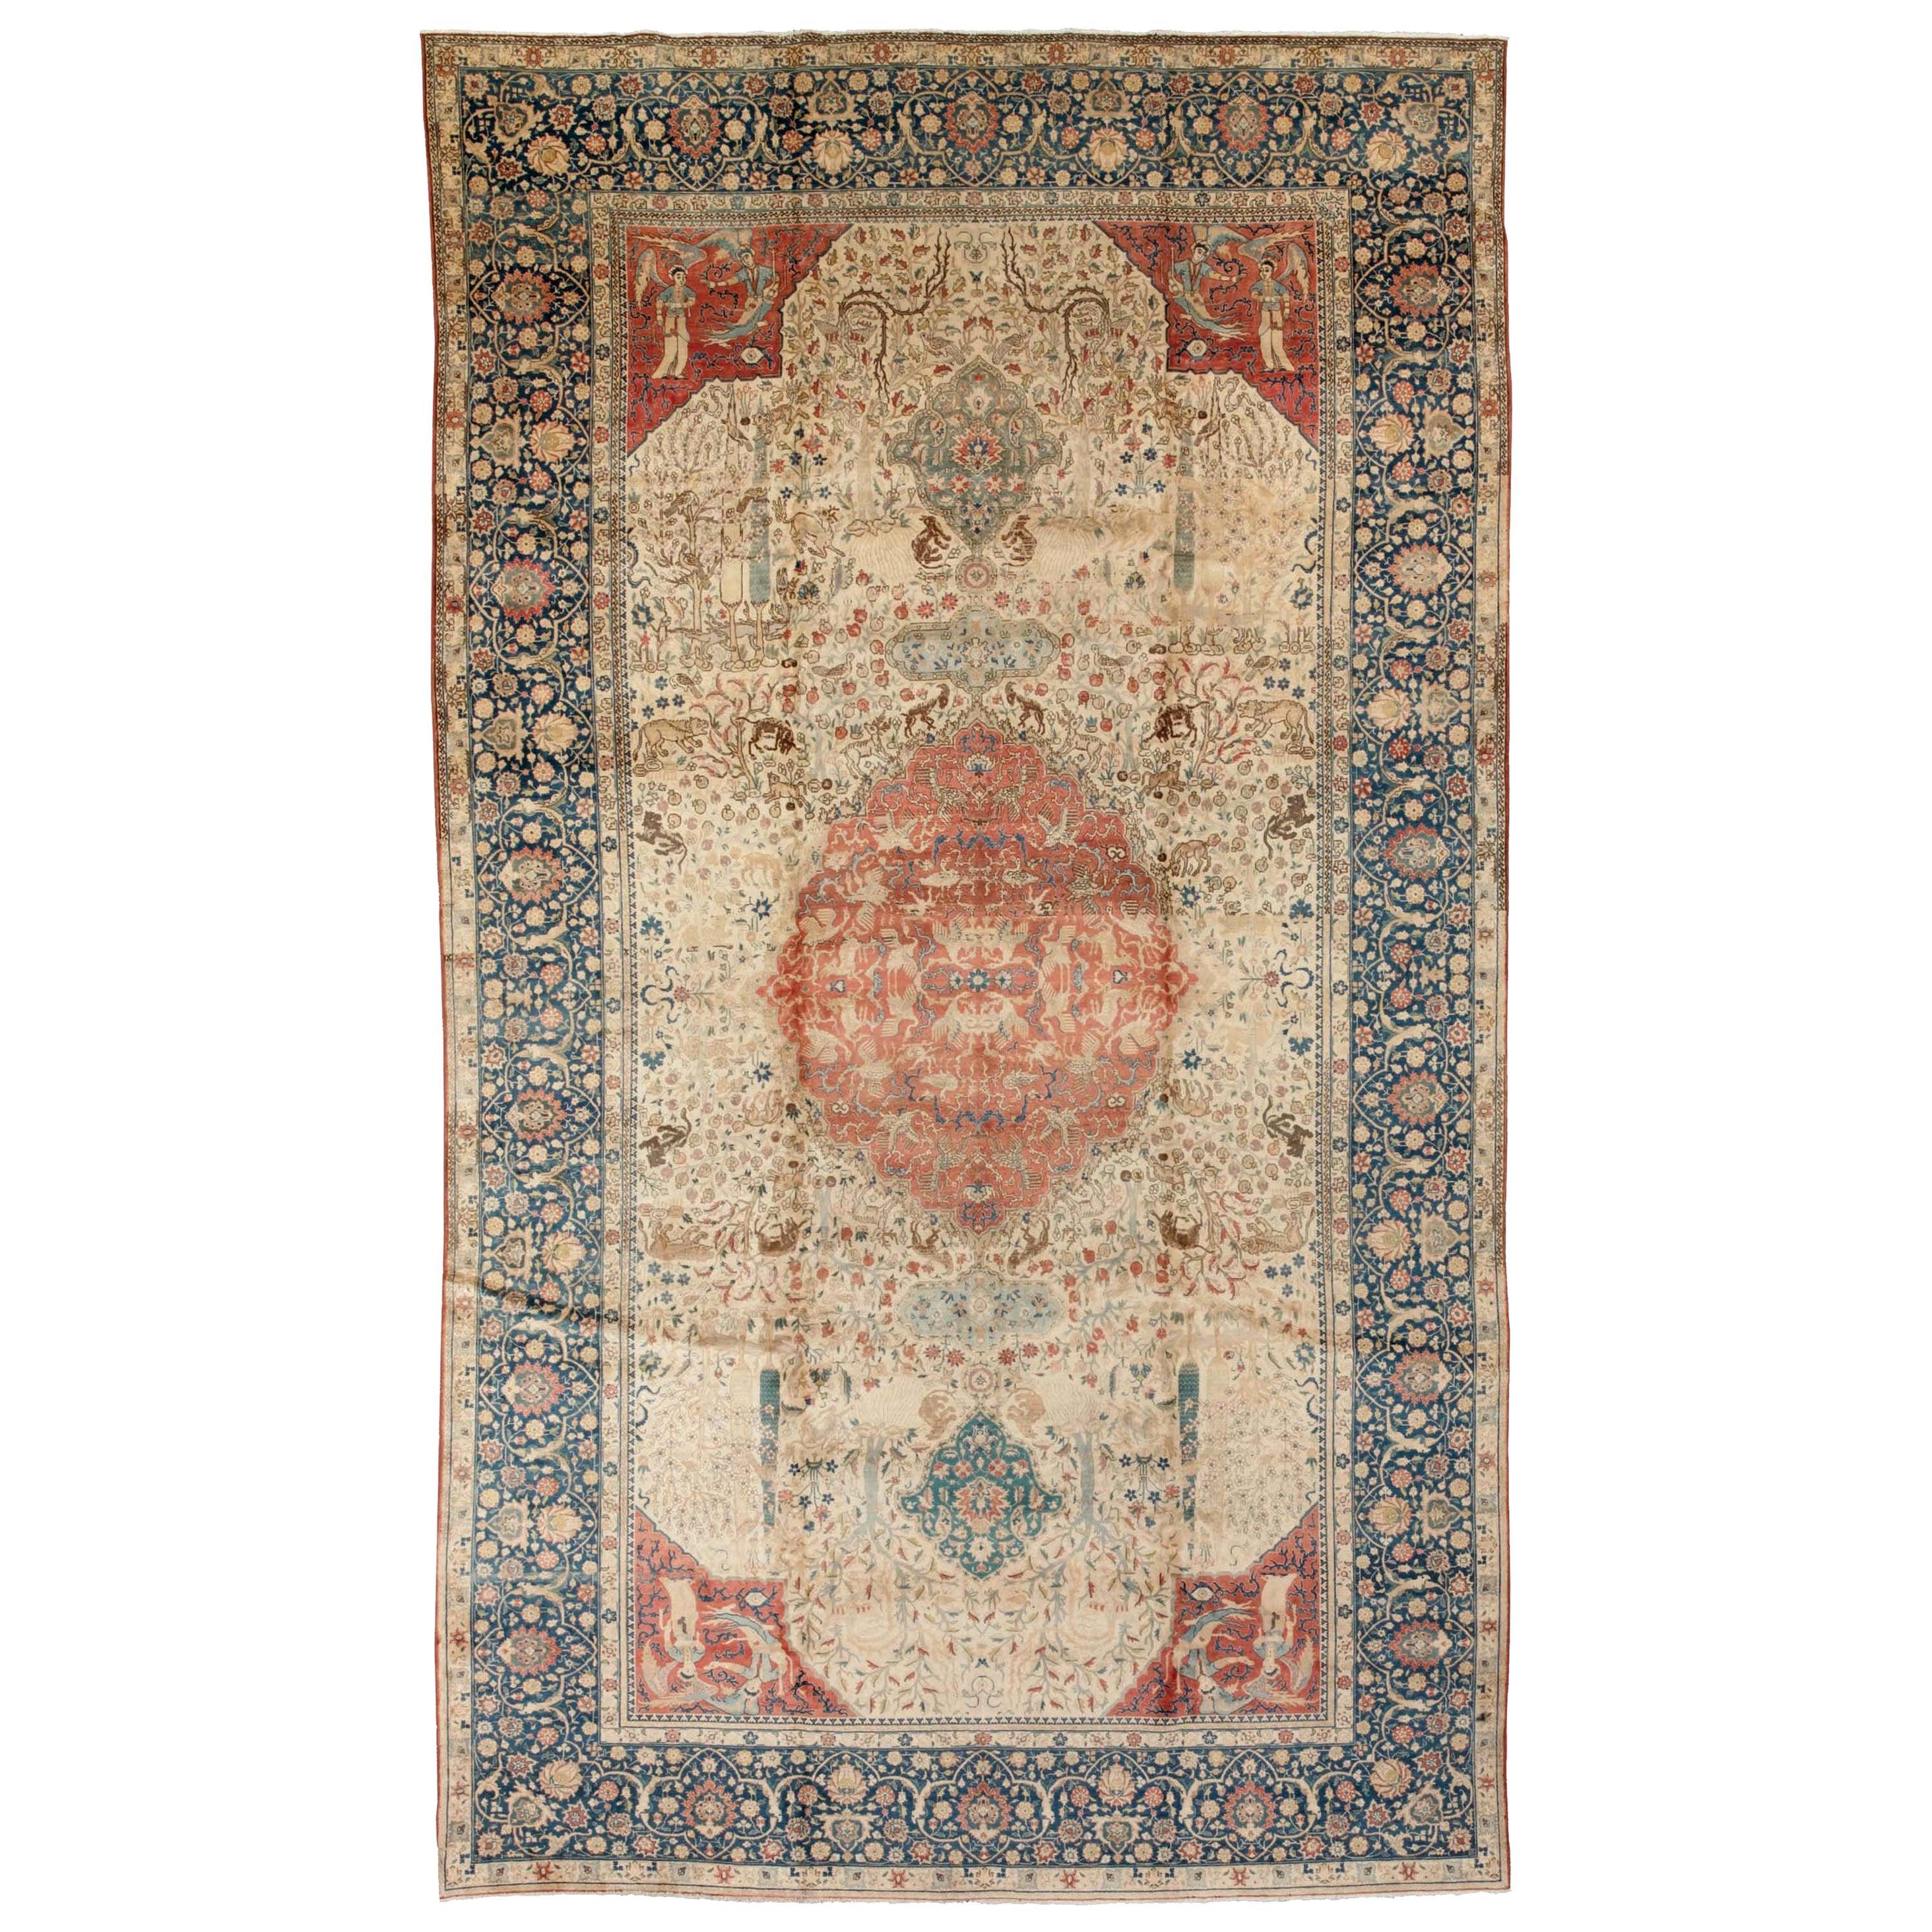 Antique Persian Tabriz Beige & Dark Blue Handwoven Wool Carpet